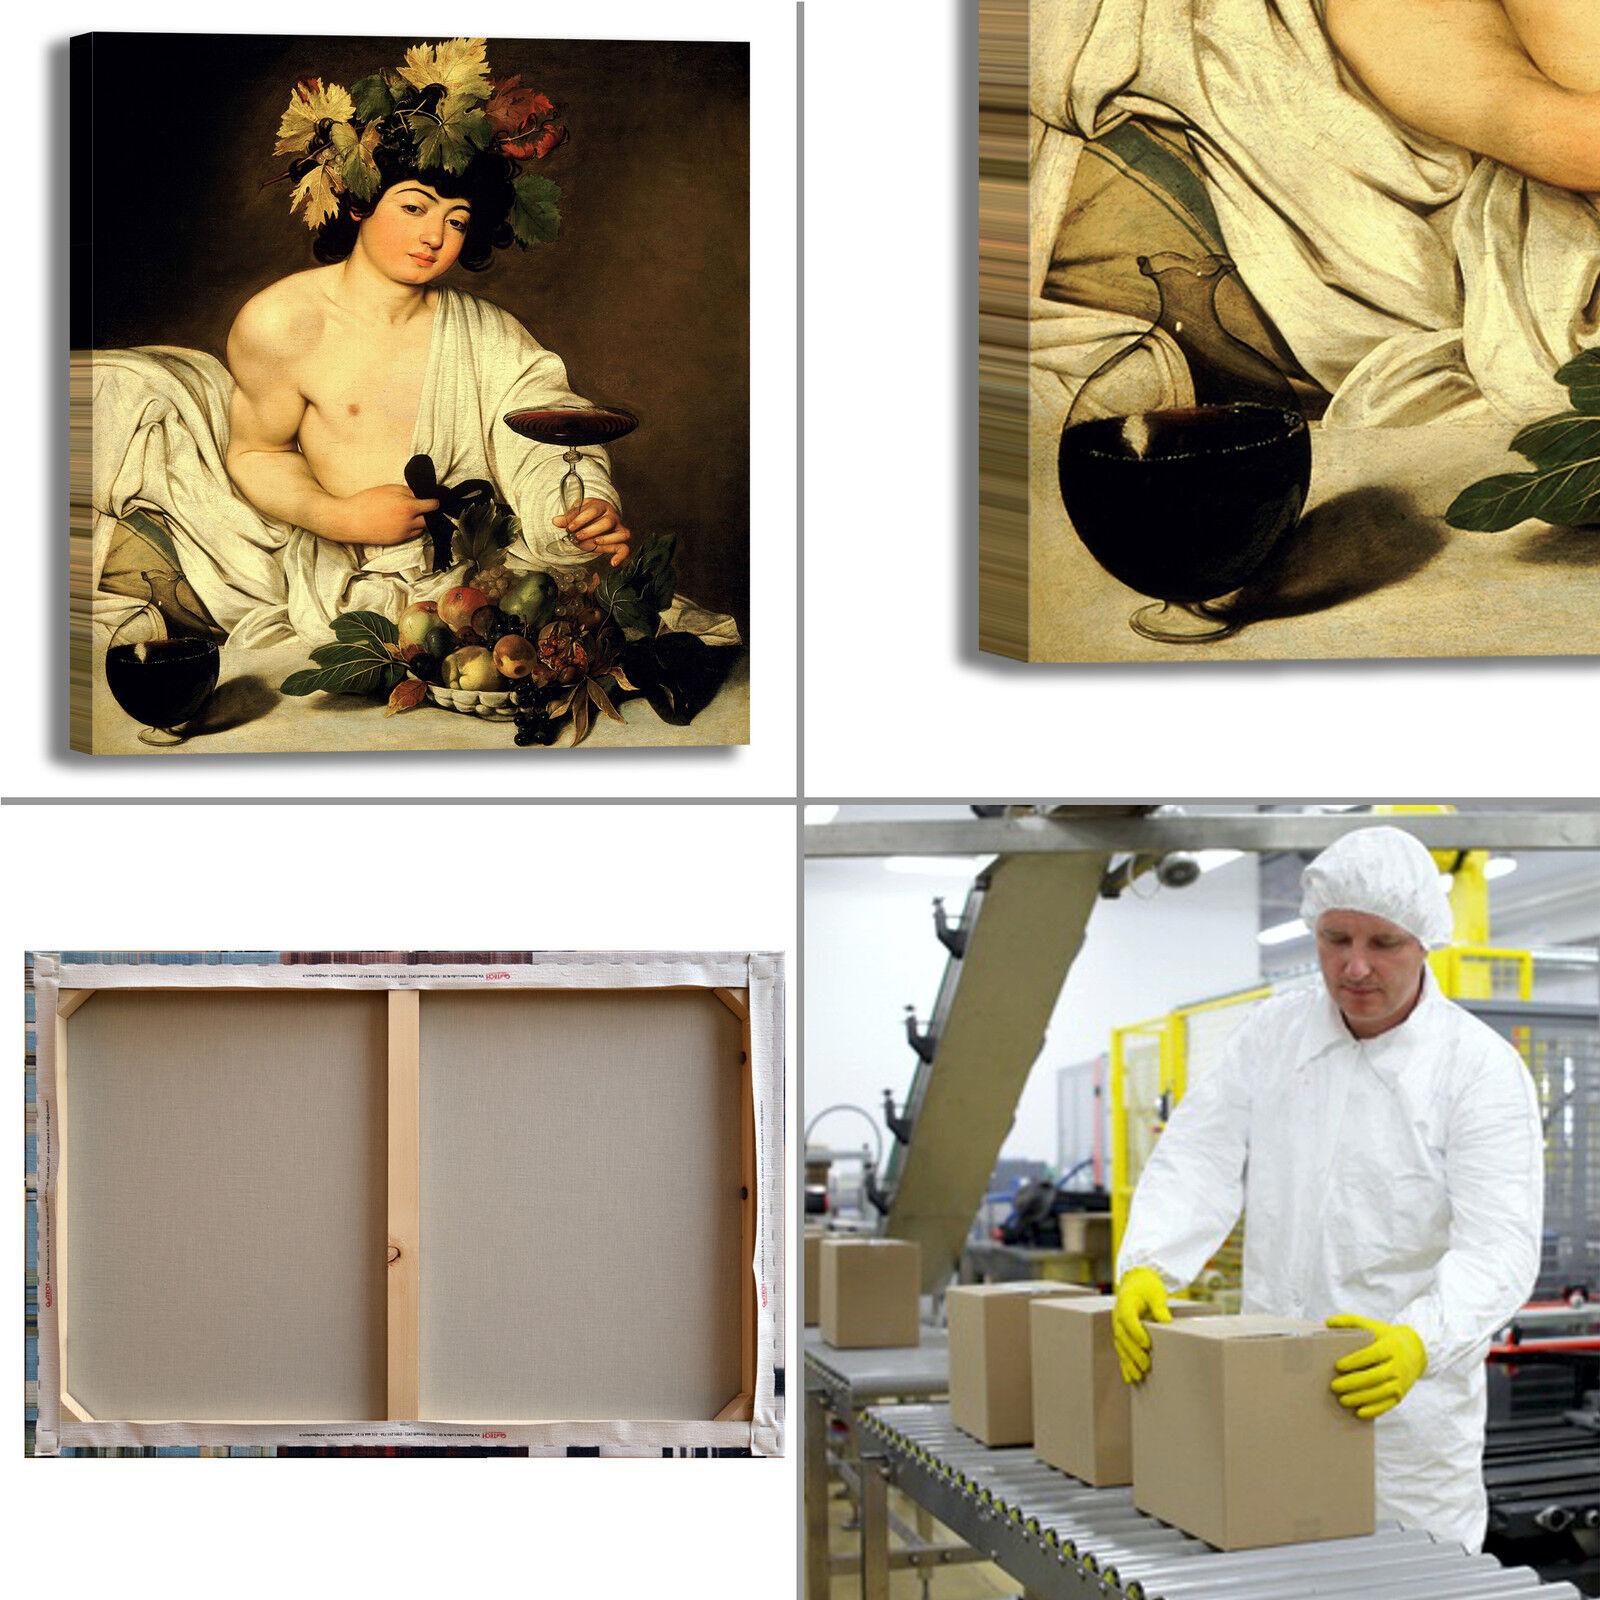 Caravaggio bacco design quadro stampa tela dipinto telaio arrossoo casa casa casa 24e29a